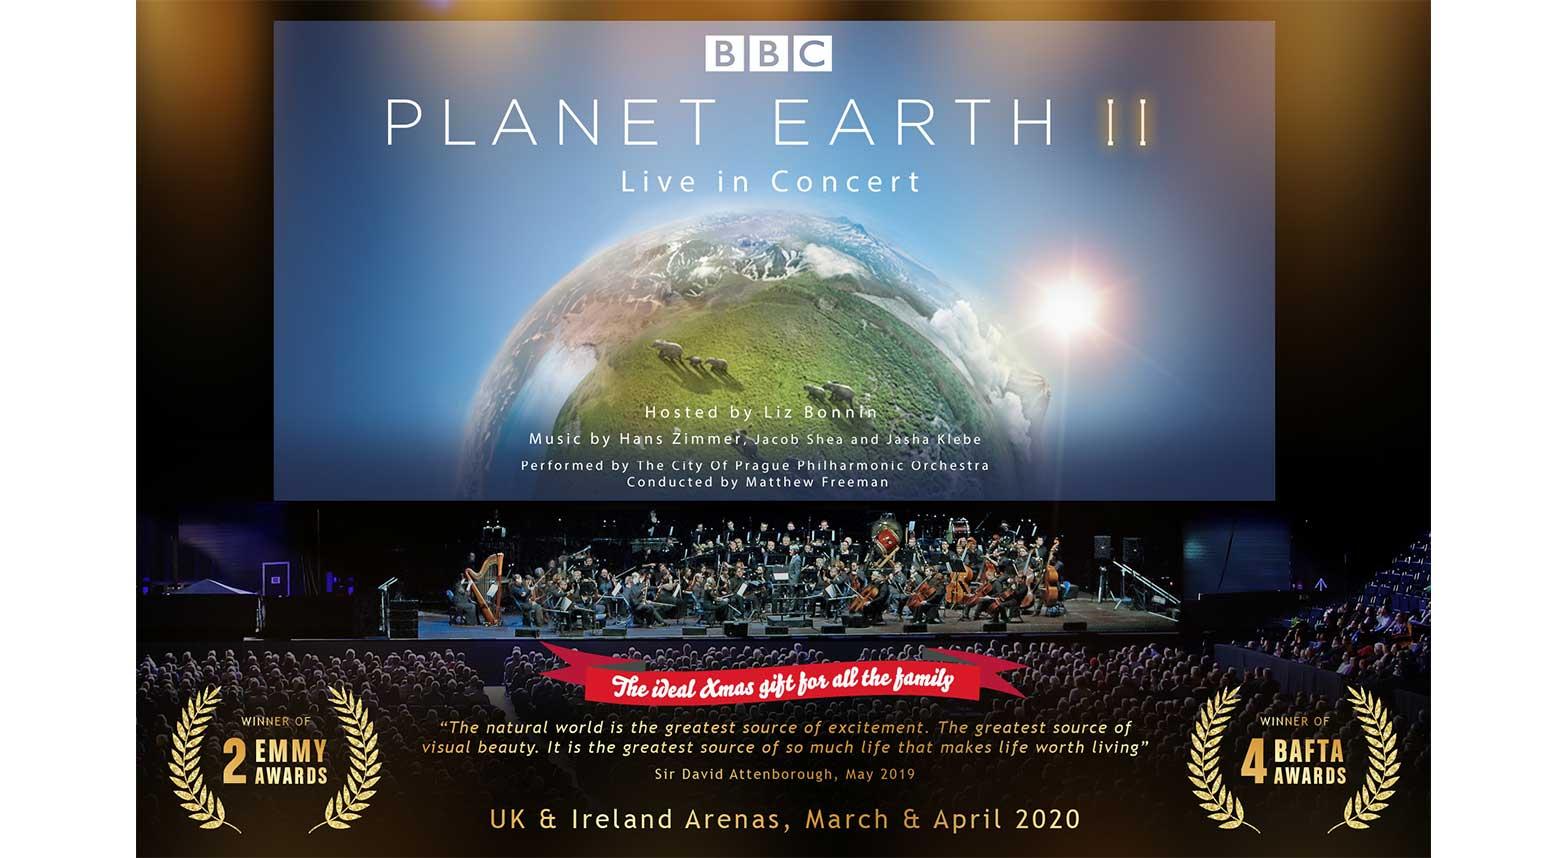 planet-earth-arenas-image2.jpg